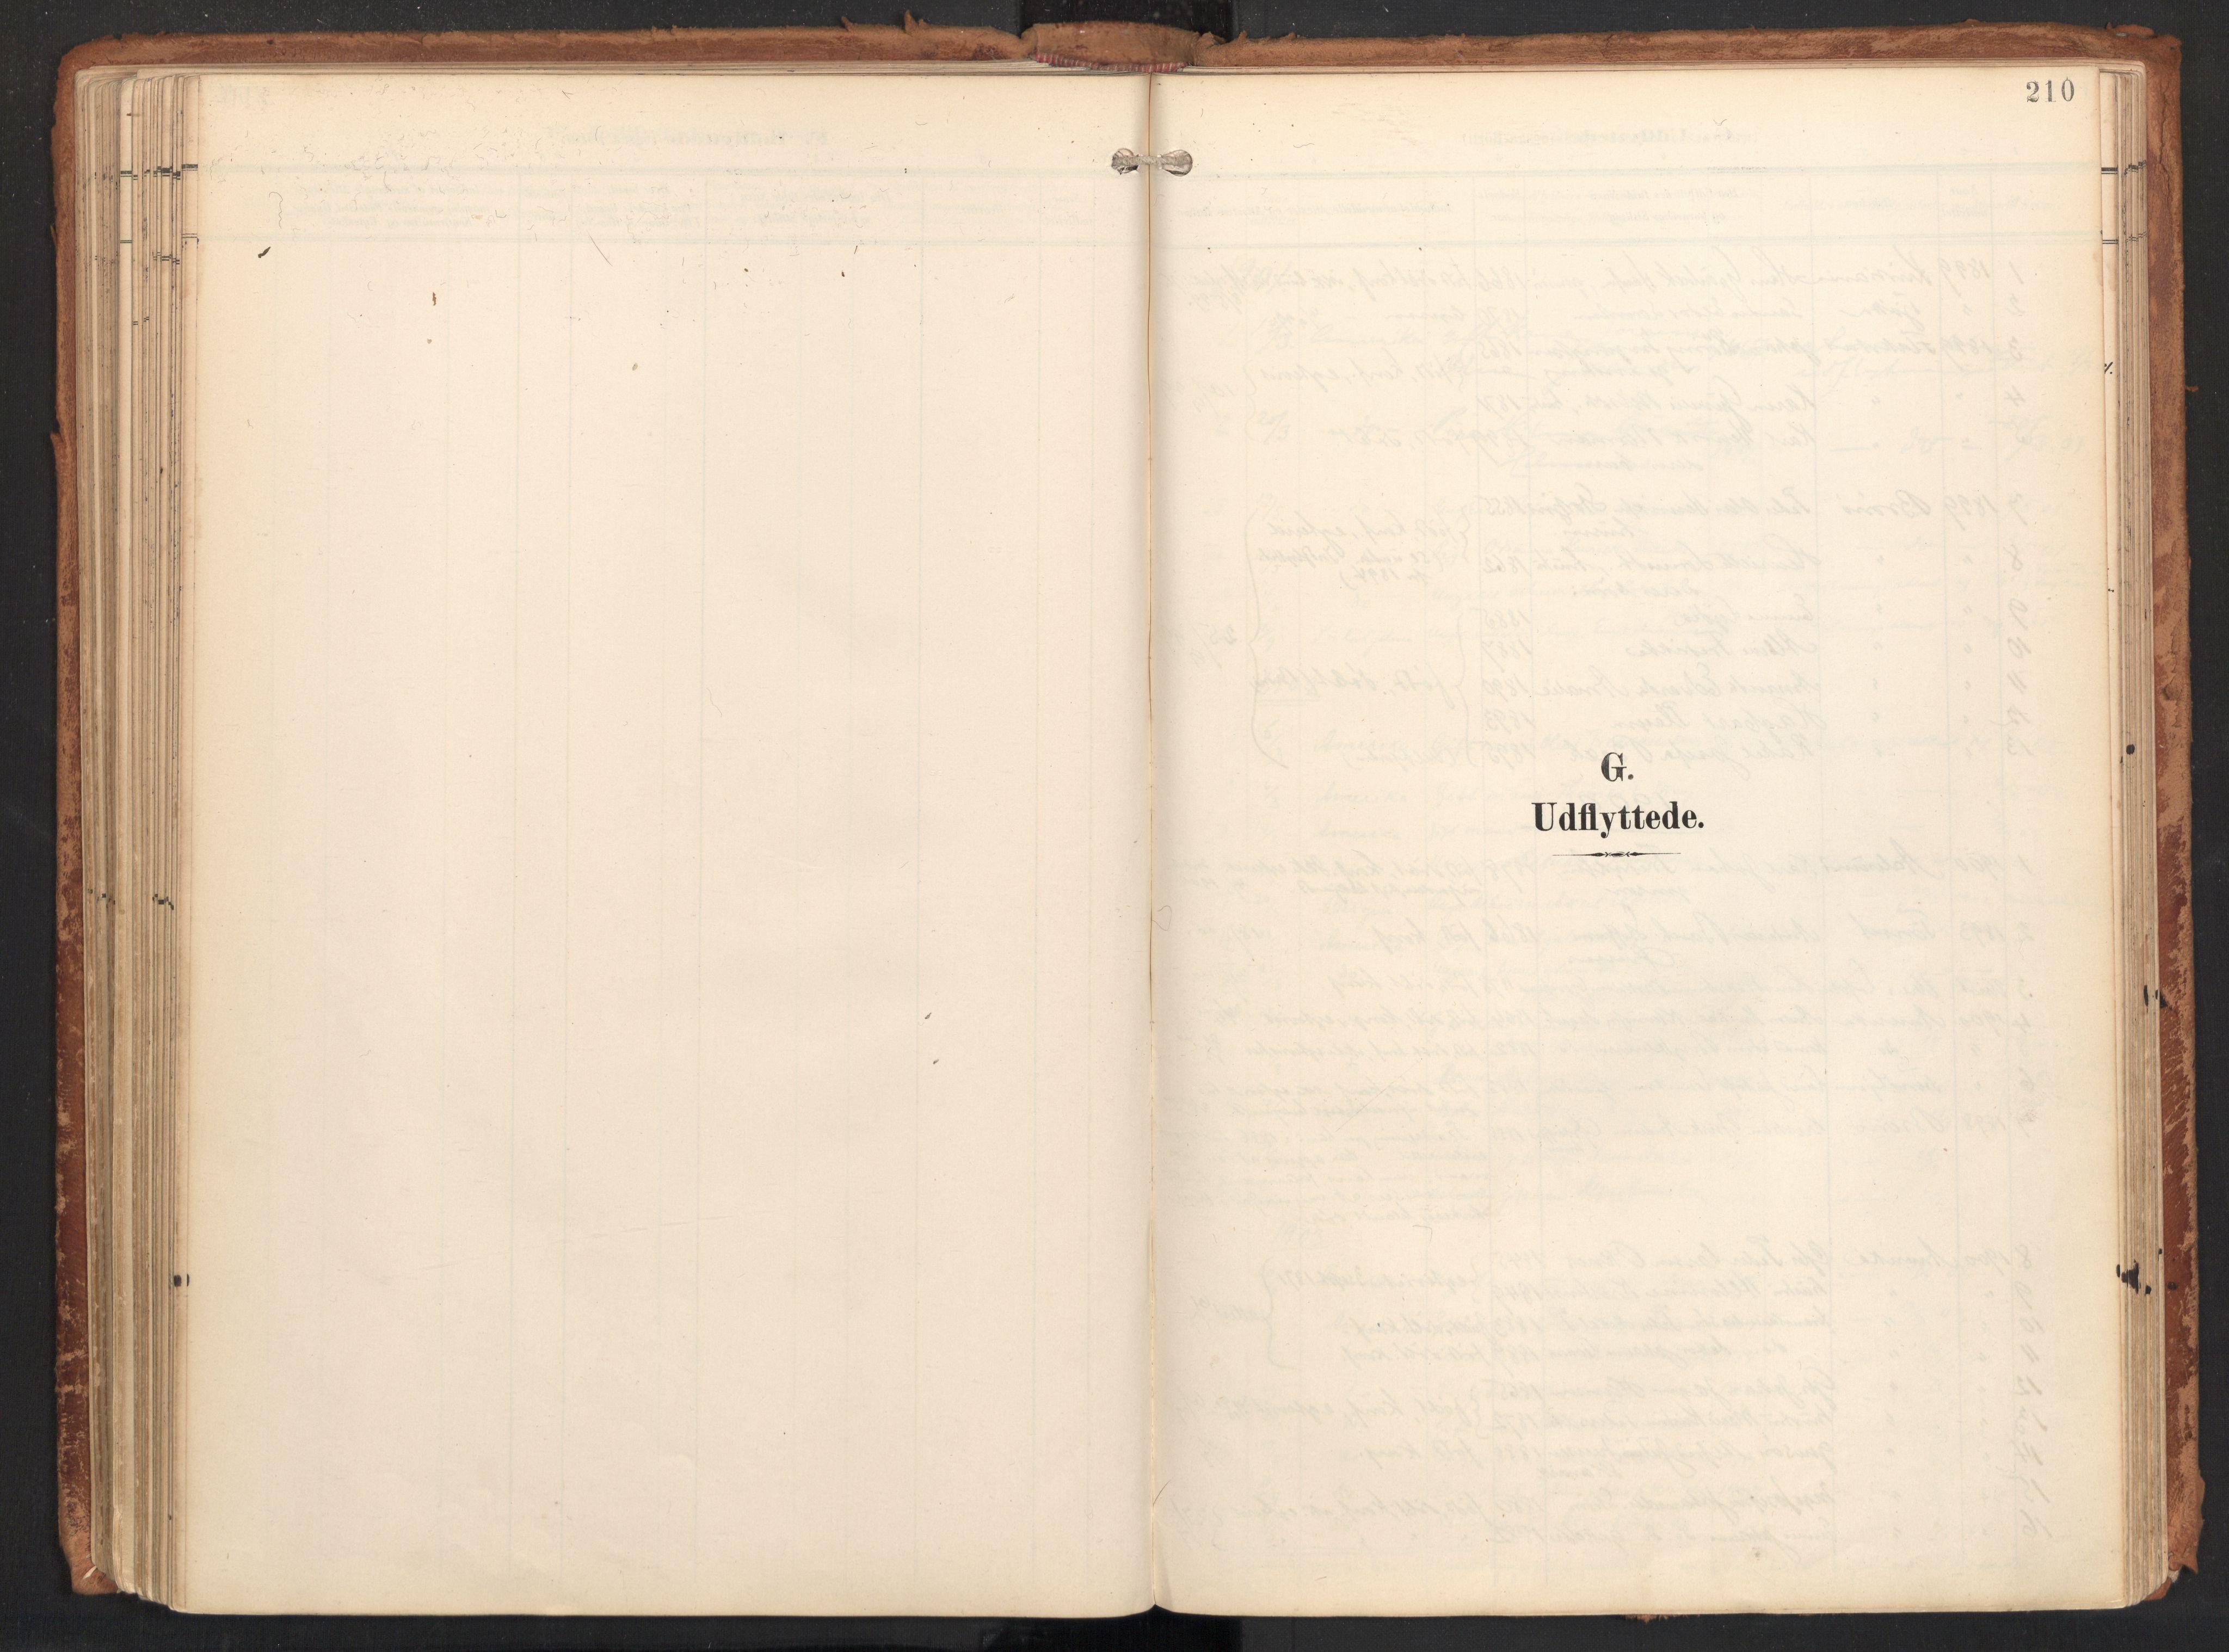 SAT, Ministerialprotokoller, klokkerbøker og fødselsregistre - Nordland, 814/L0227: Ministerialbok nr. 814A08, 1899-1920, s. 210